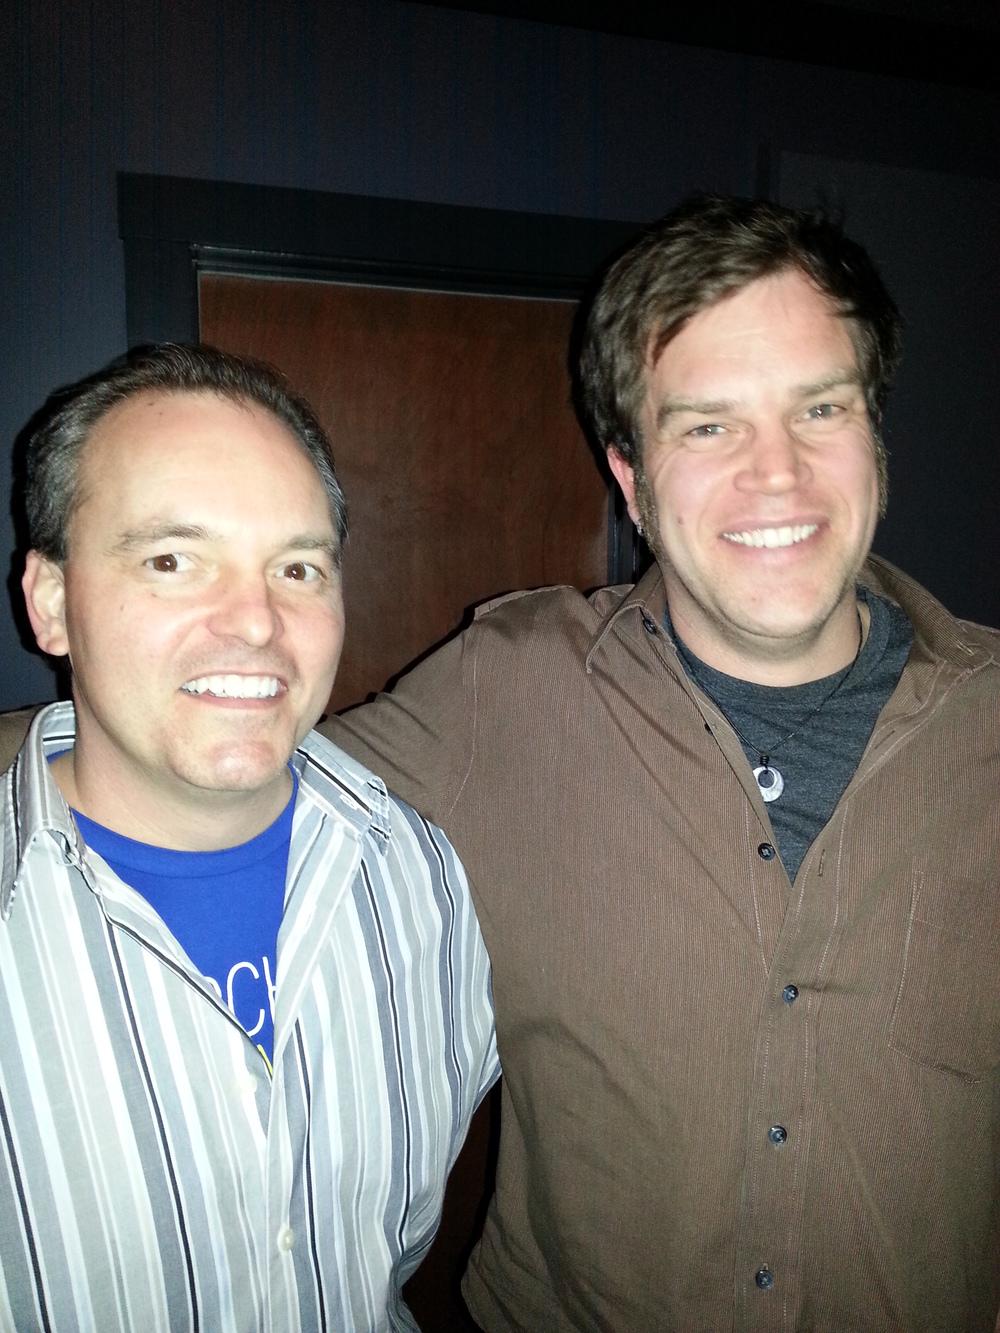 Joe Kendrick and Aaron Burdett at Moonlight Mile Productions in Arden, NC